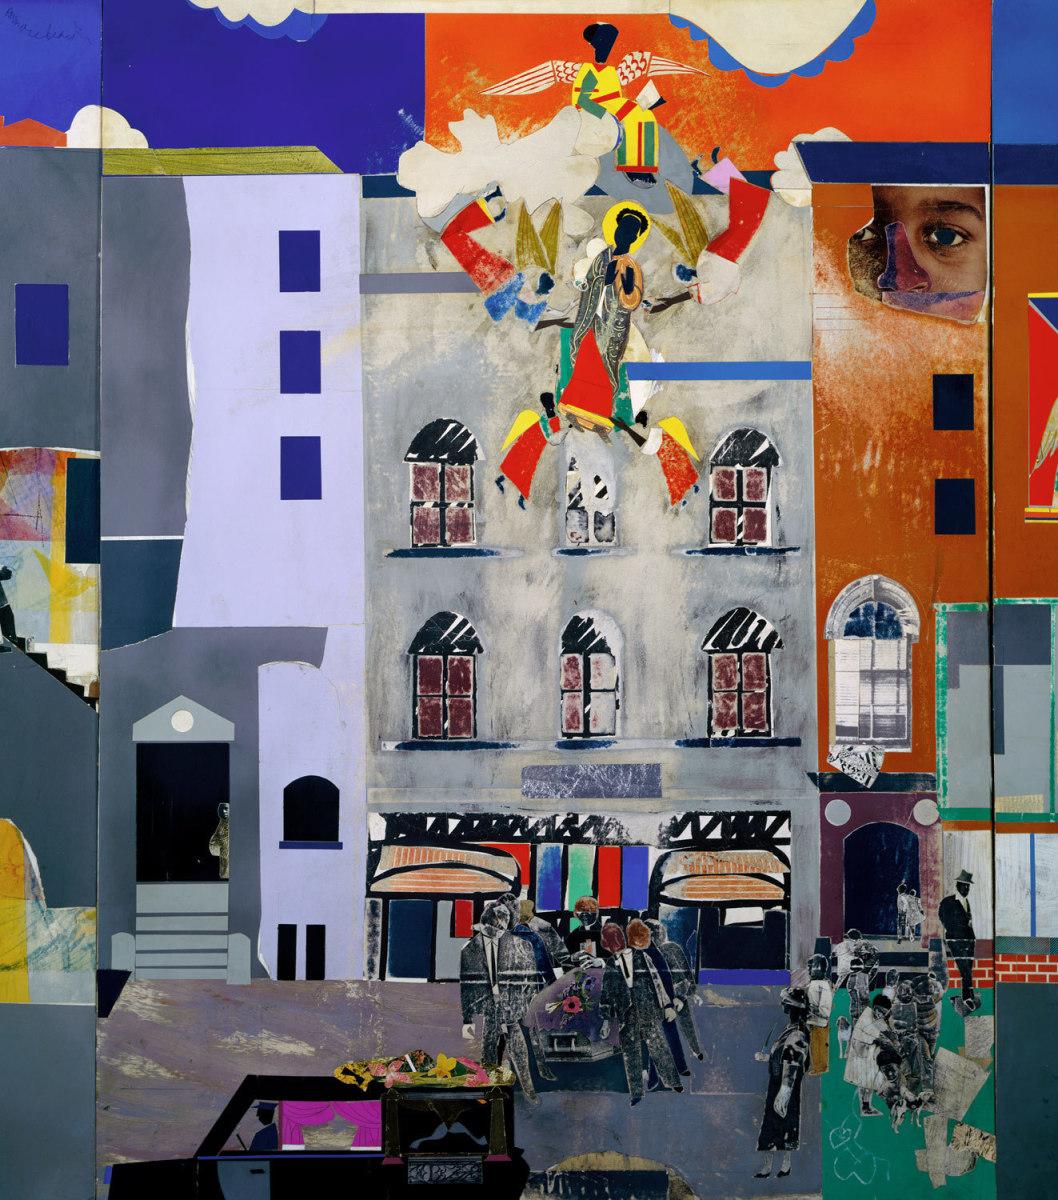 The Block by Romare Bearden